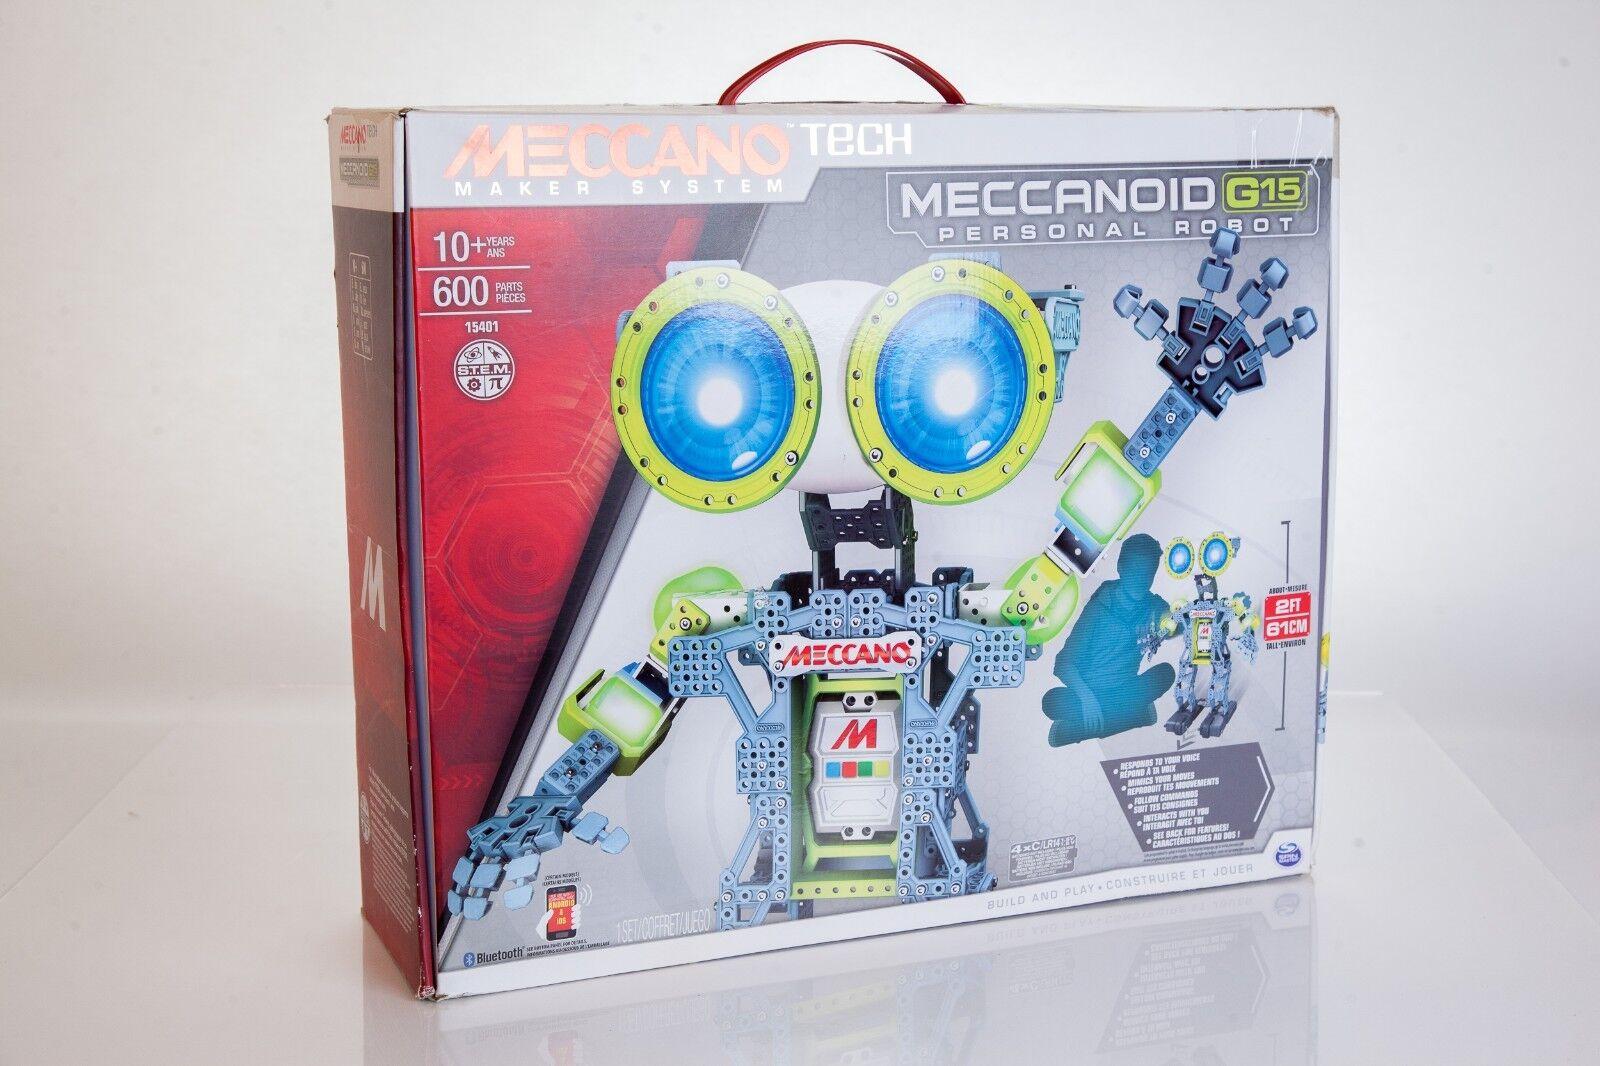 Meccano MeccaNoid G15 Android Robot 600 Piece Metal Building Set A4-3